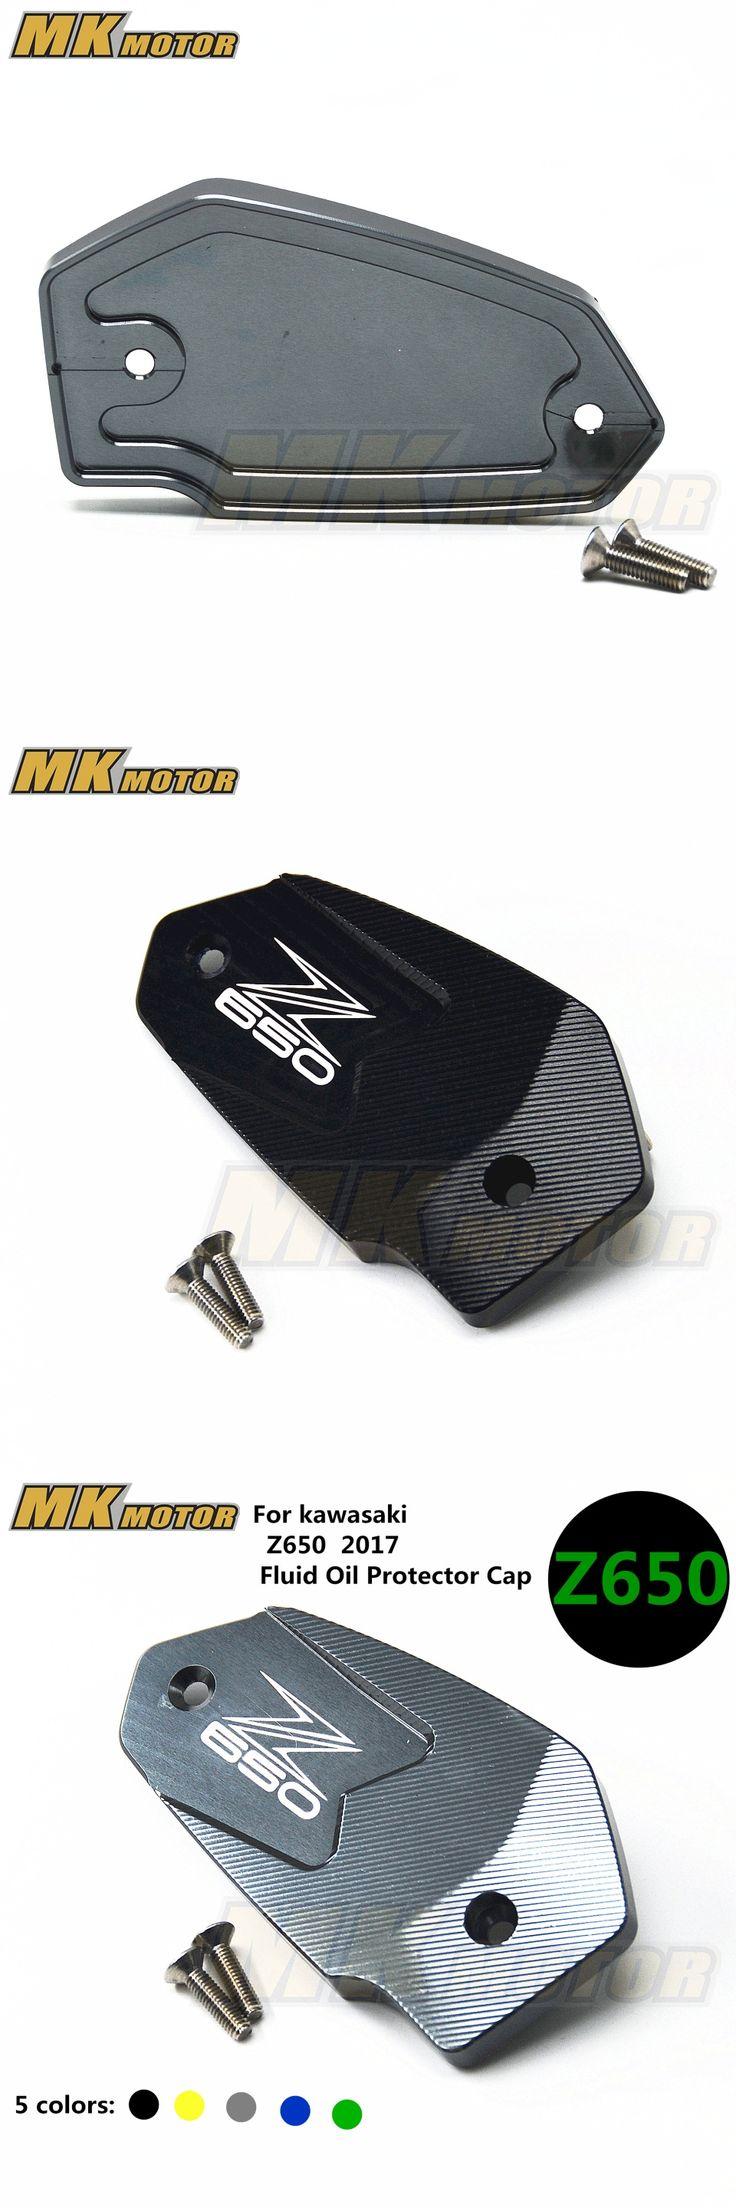 For Kawasaki Z650 with logo 2017 Motorcycle accessories Aluminum Brake Fluid Reservoir clutch Fluid Oil Protector Cap 8 colors